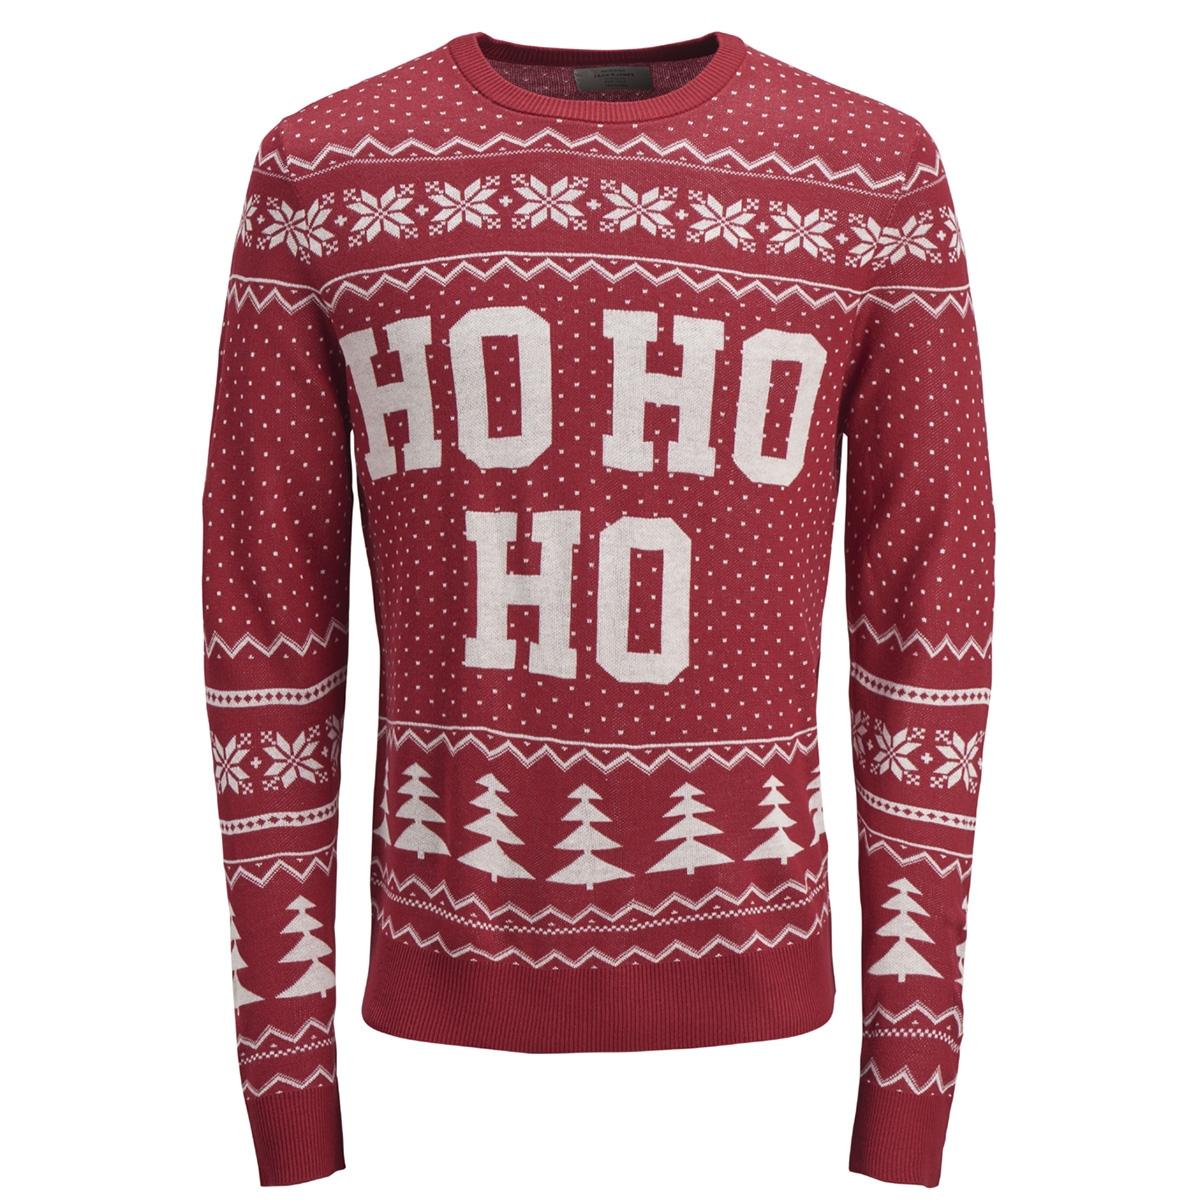 jorflake knit crew neck 12143001 jack & jones trui scarlet sage/knit fit